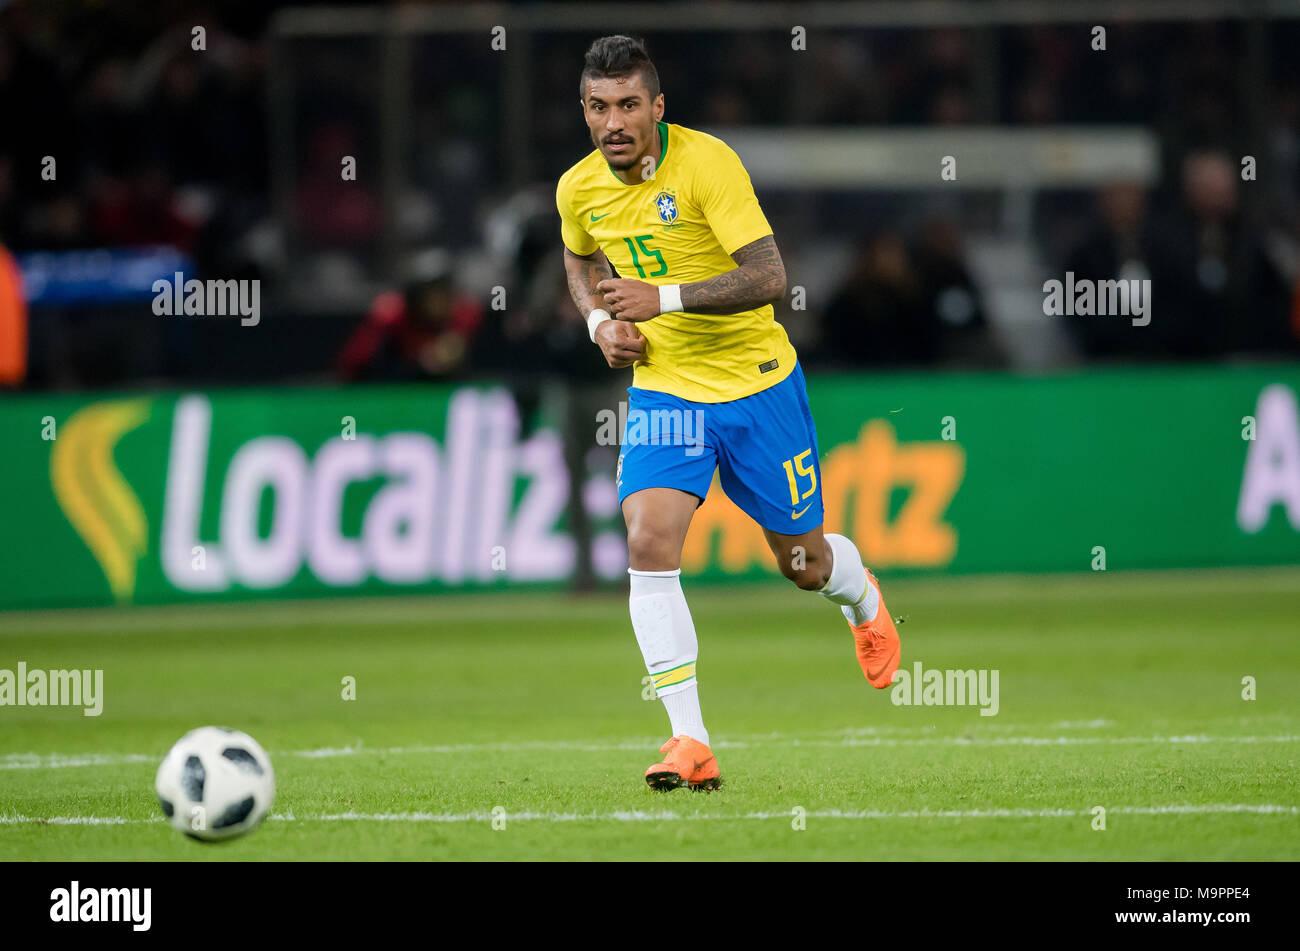 Paulinho (Brasilien) am Ball  GES/ Fussball/ Freundschaftsspiel: Germany - Brasilien, 27.03.2018  Football / Soccer: Friendly Match: Germany vs Brazil, Berlin, March 27, 2018  usage worldwide - Stock Image